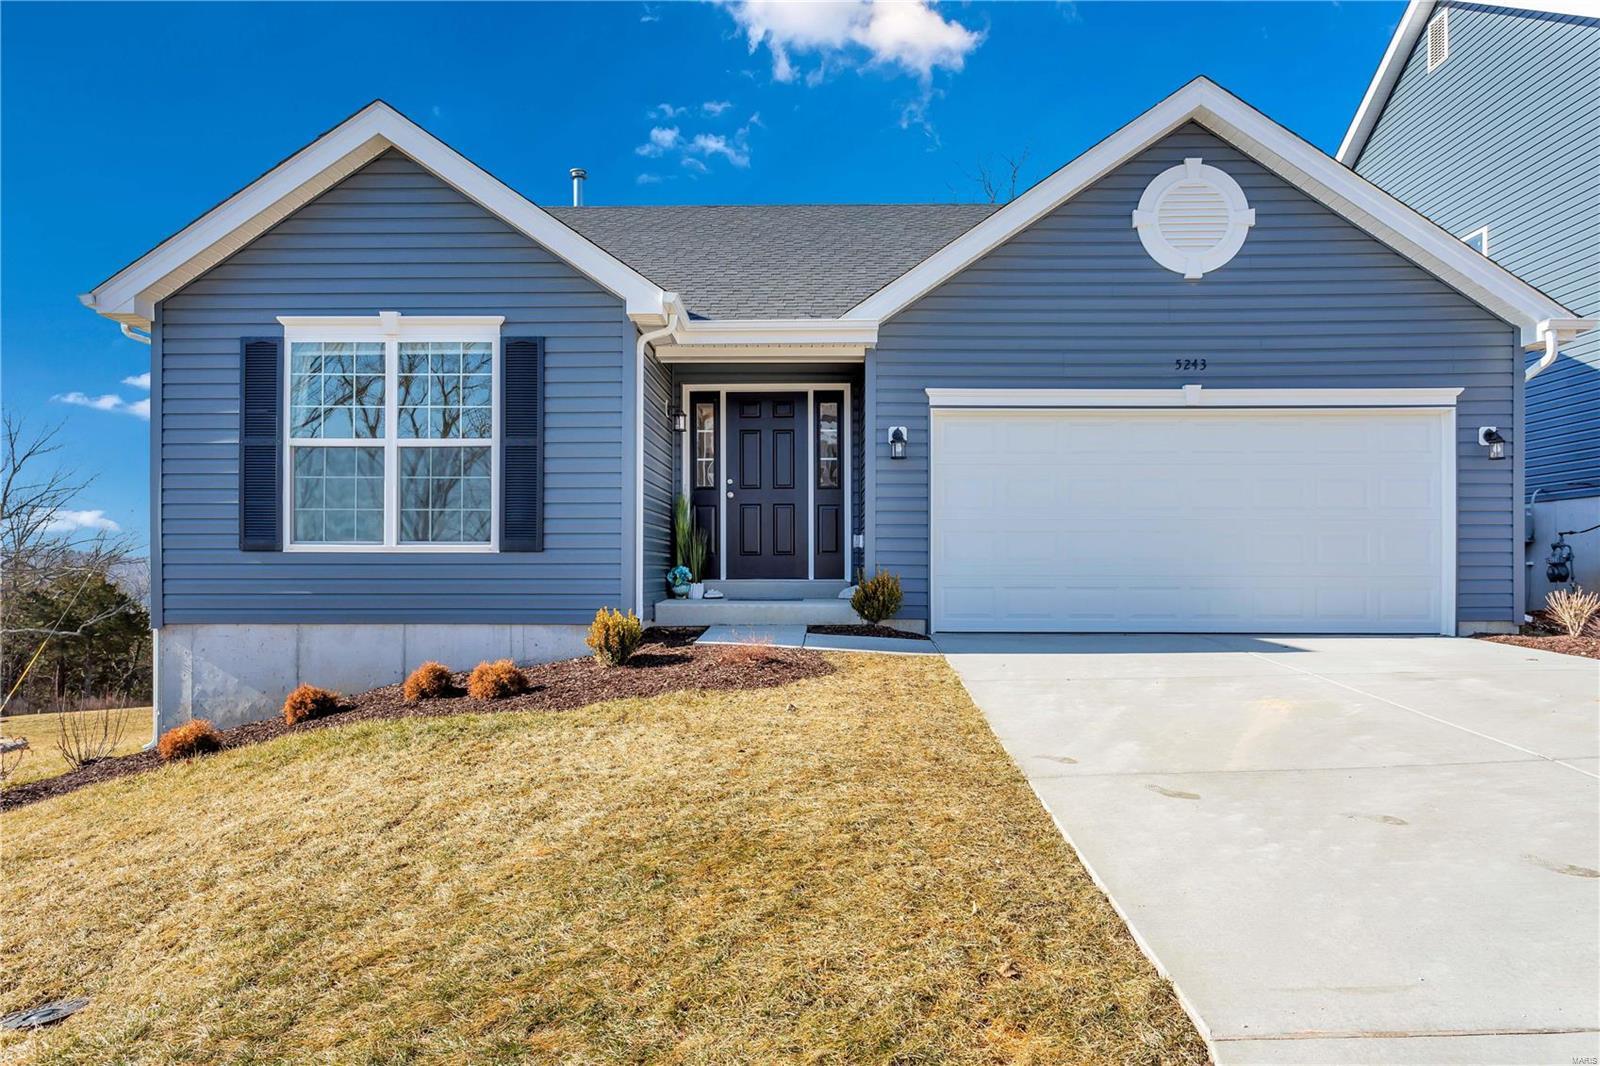 5243 Shawnee View Property Photo - Eureka, MO real estate listing